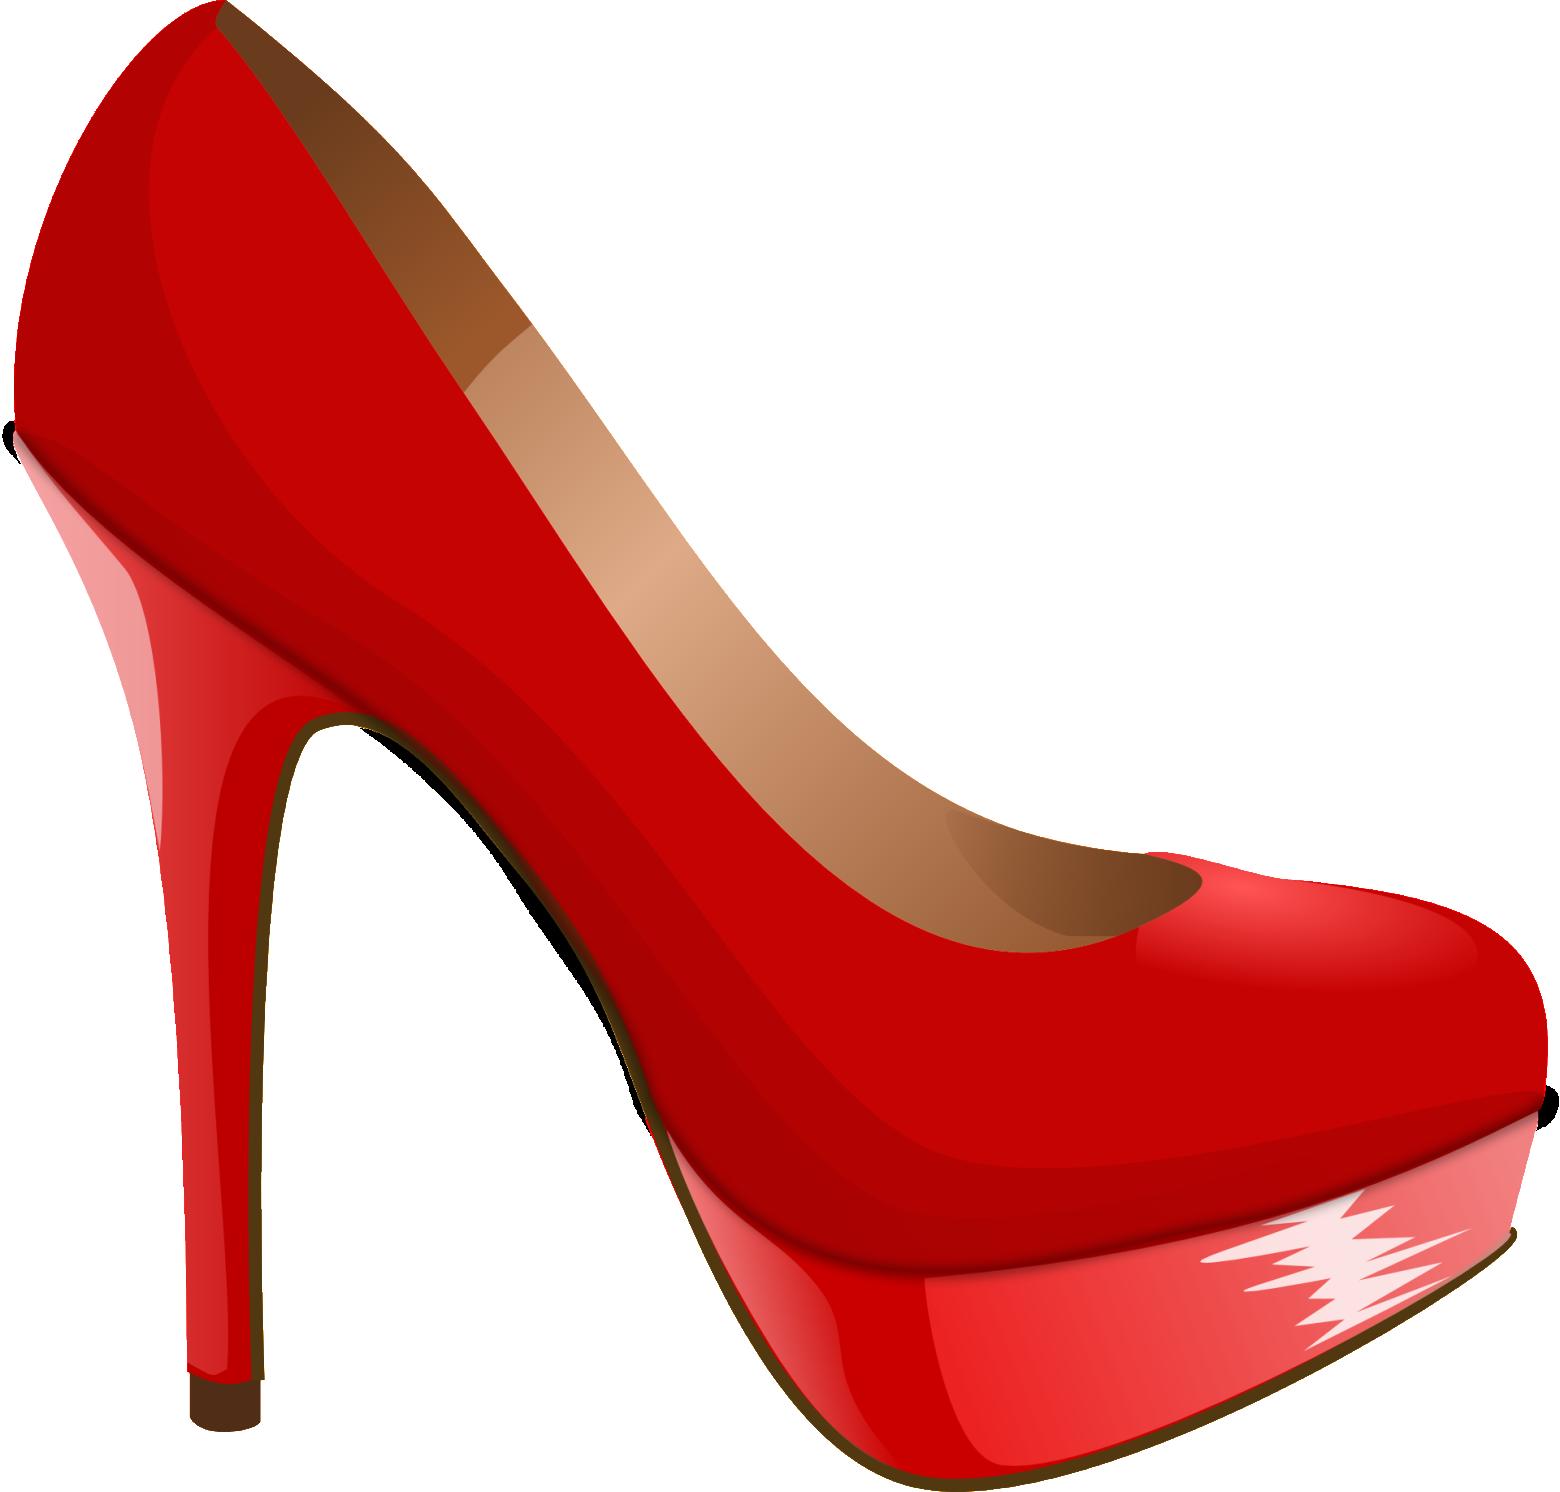 mode chaussure escarpin rouge illustrations vecteurs. Black Bedroom Furniture Sets. Home Design Ideas